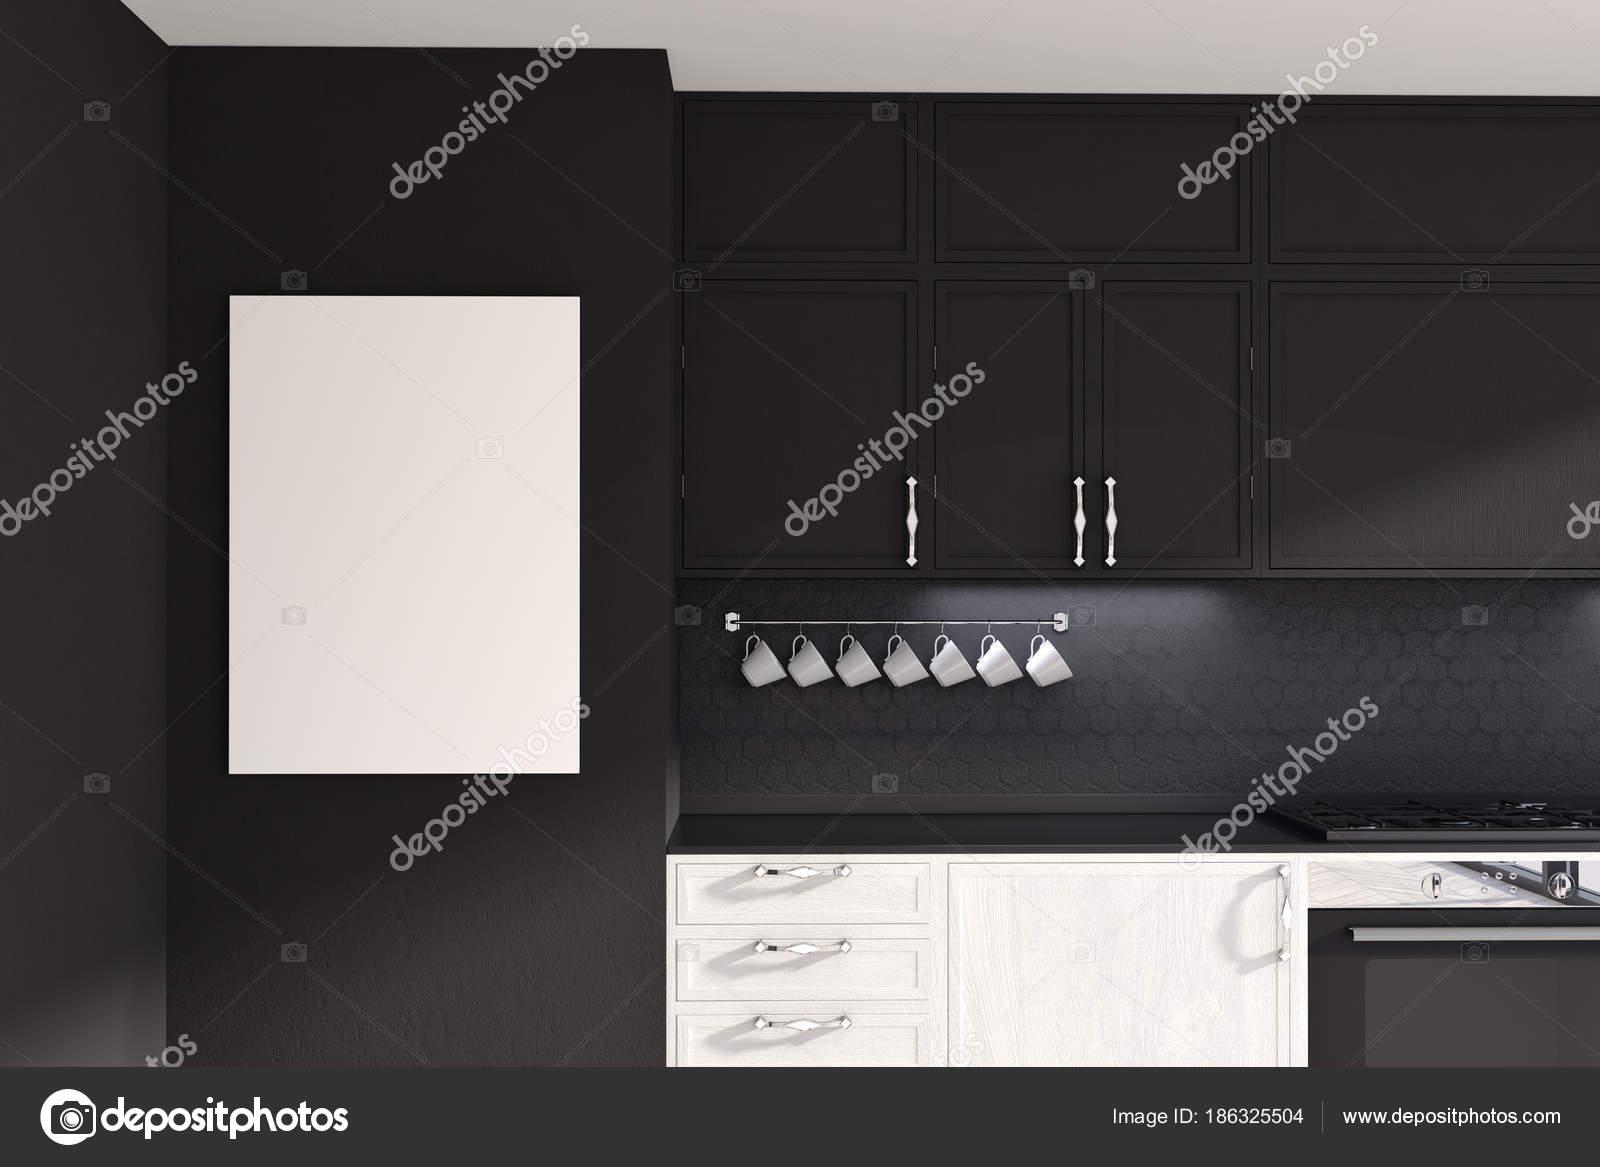 Witte en zwarte originele keuken idee poster u stockfoto